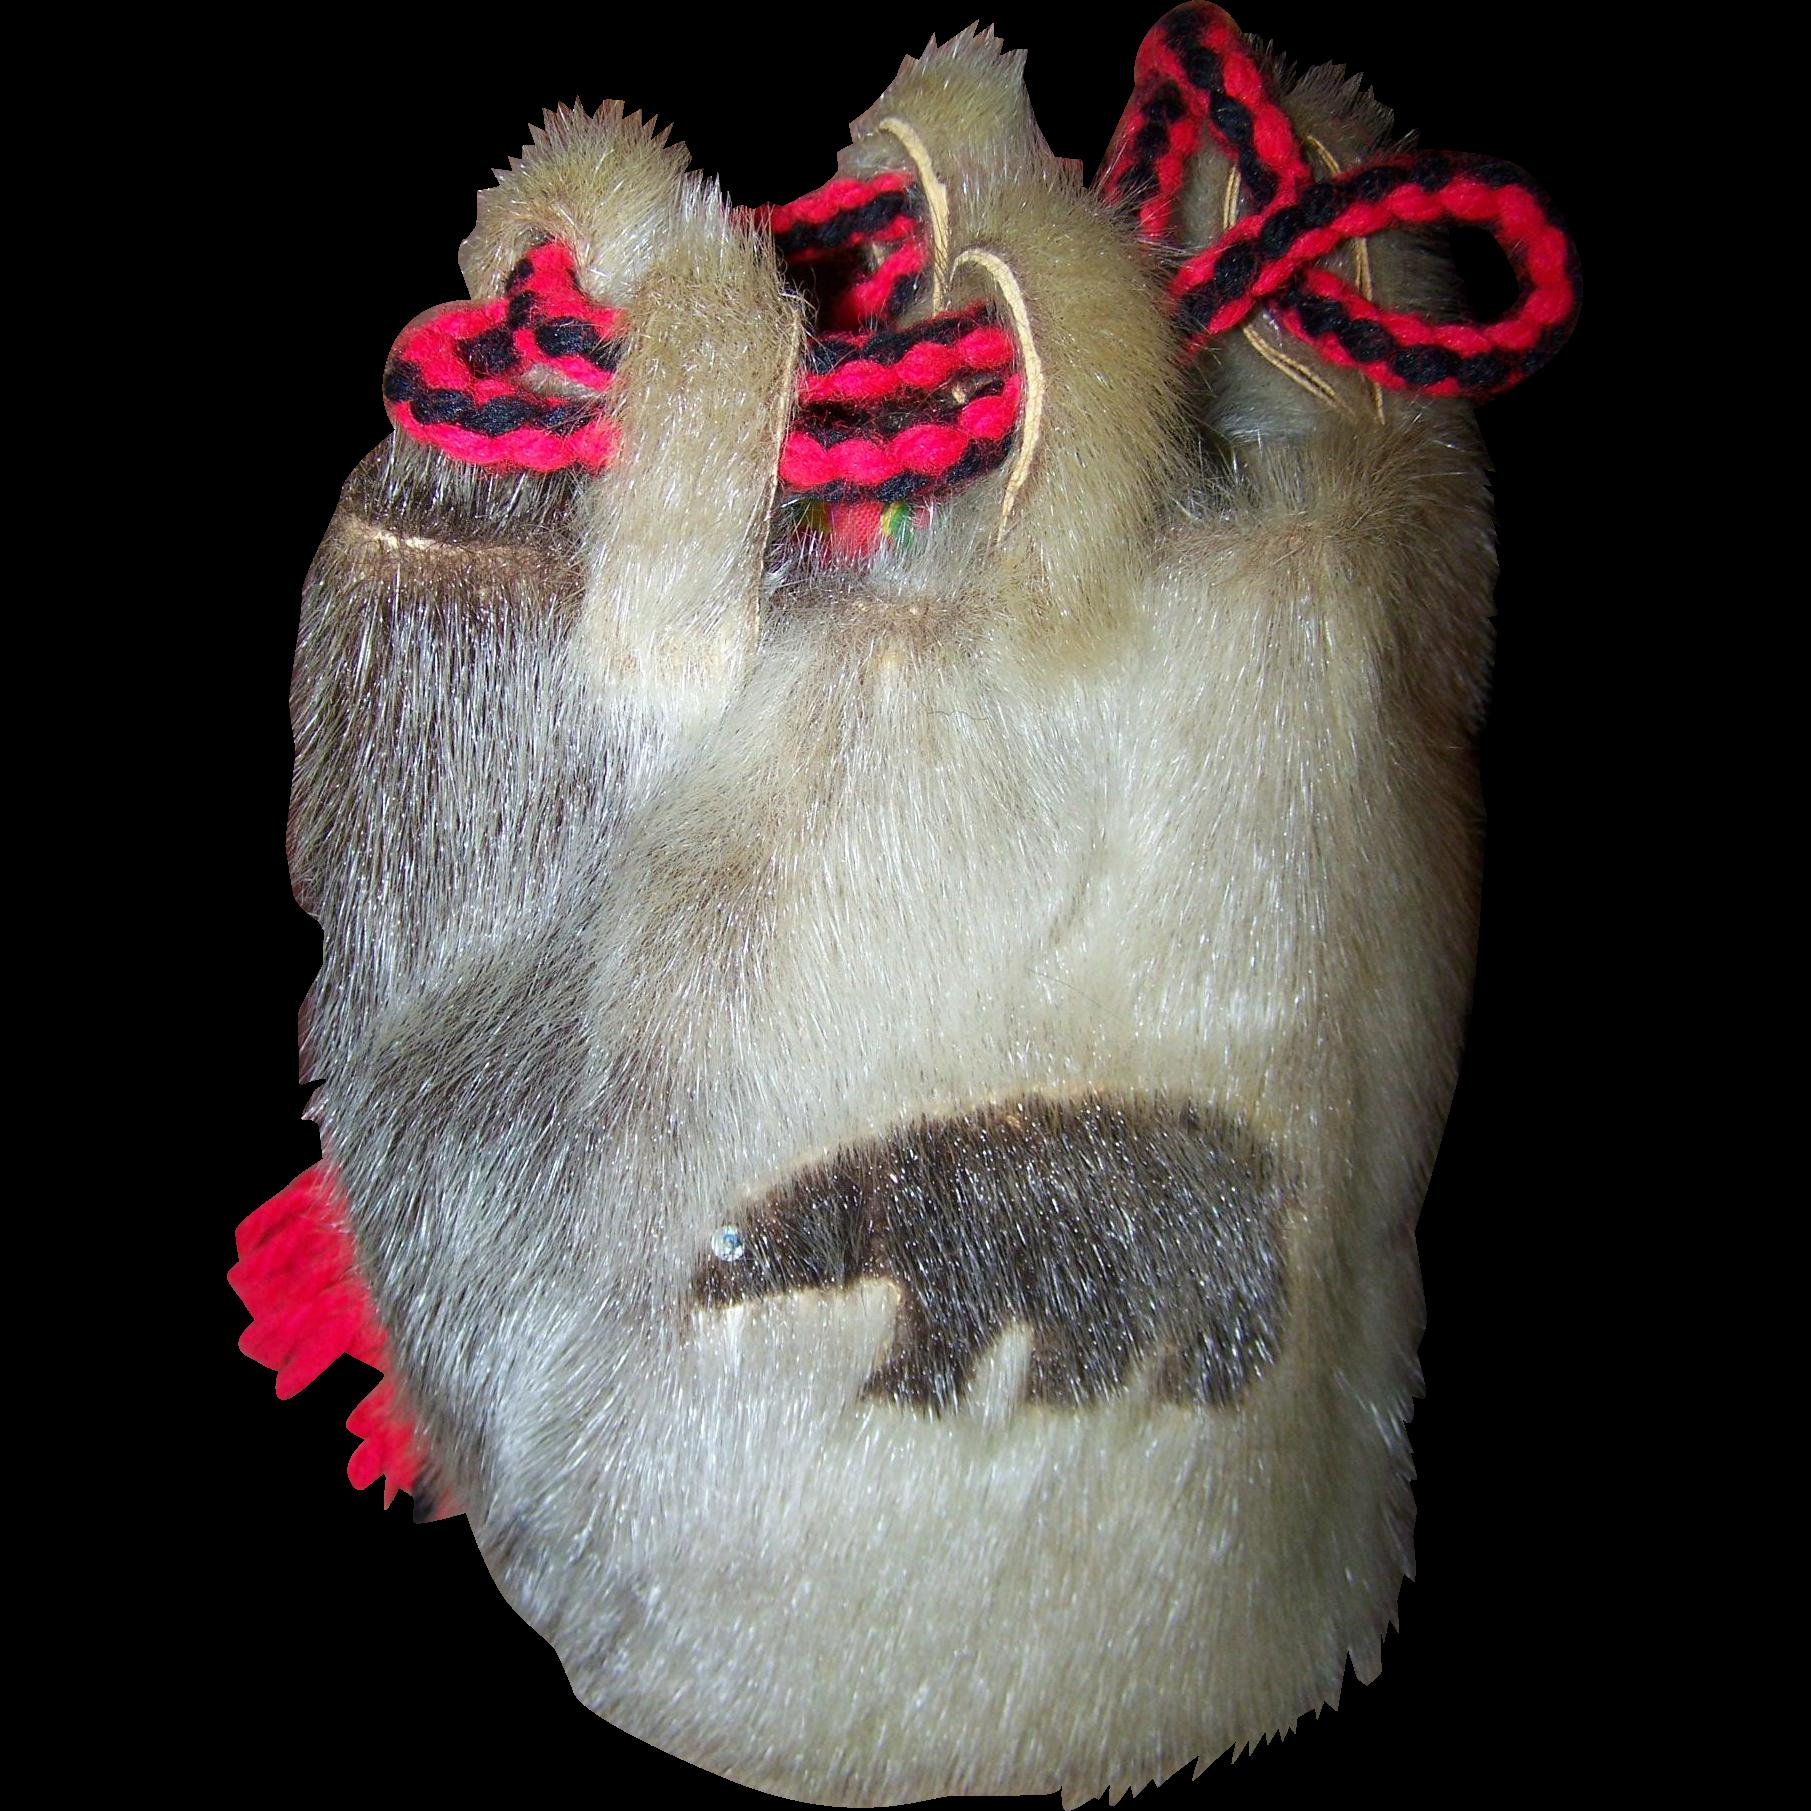 Vintage Tourist Trade Native Aboriginal Inuit Fur Drawstring Bag Purse